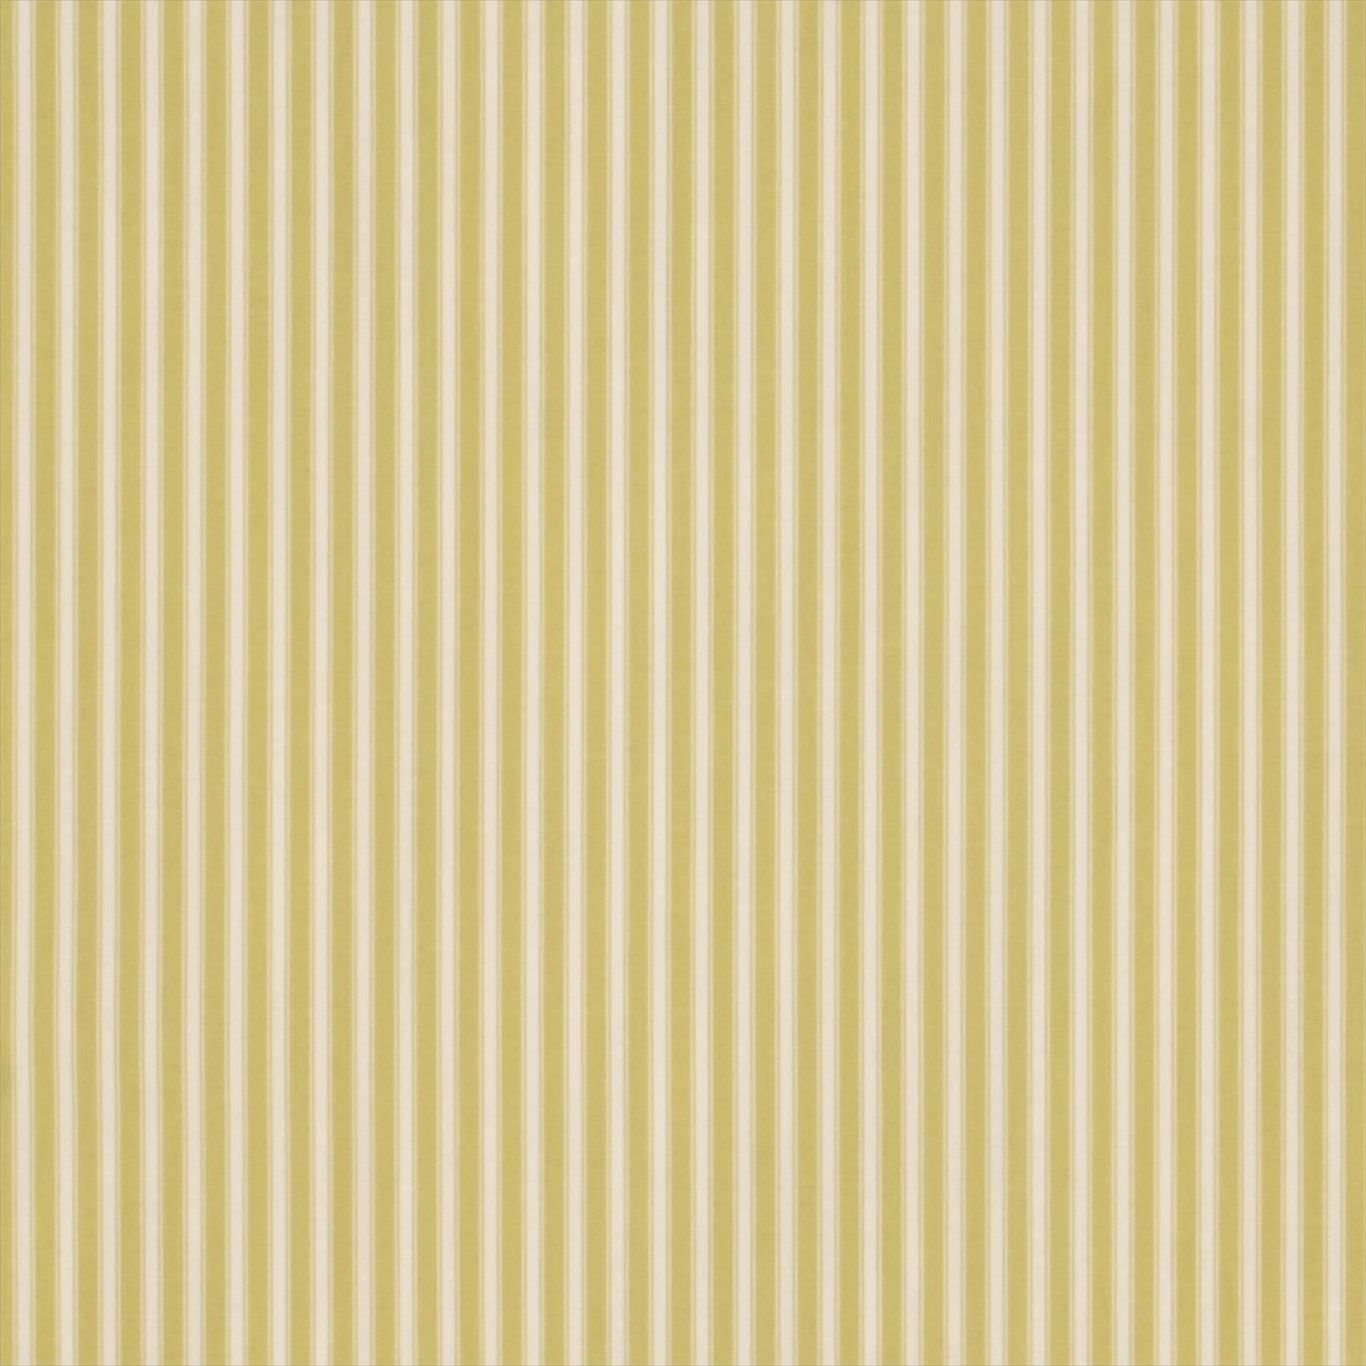 New Tiger Stripe (DCAVTS201)   Caverley Prints